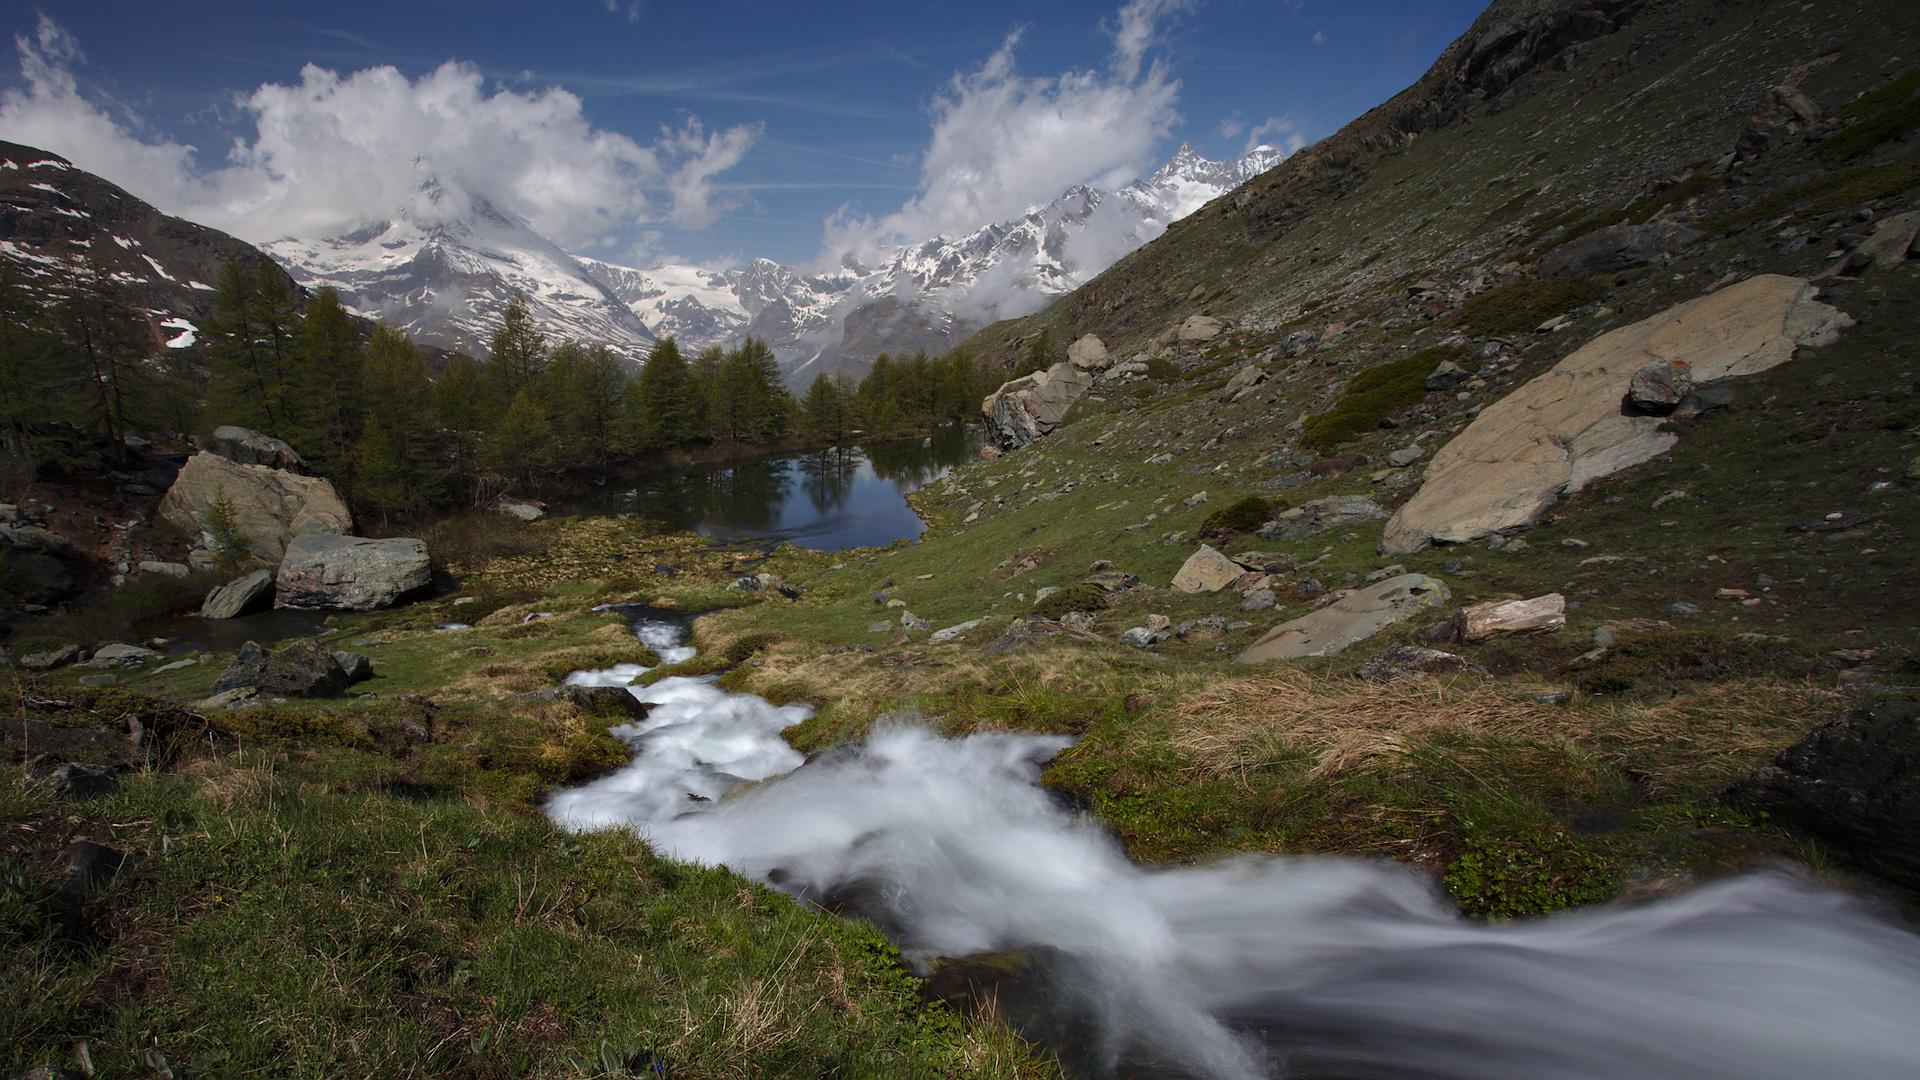 View from Grinjisee to the Matterhorn, Switzerland